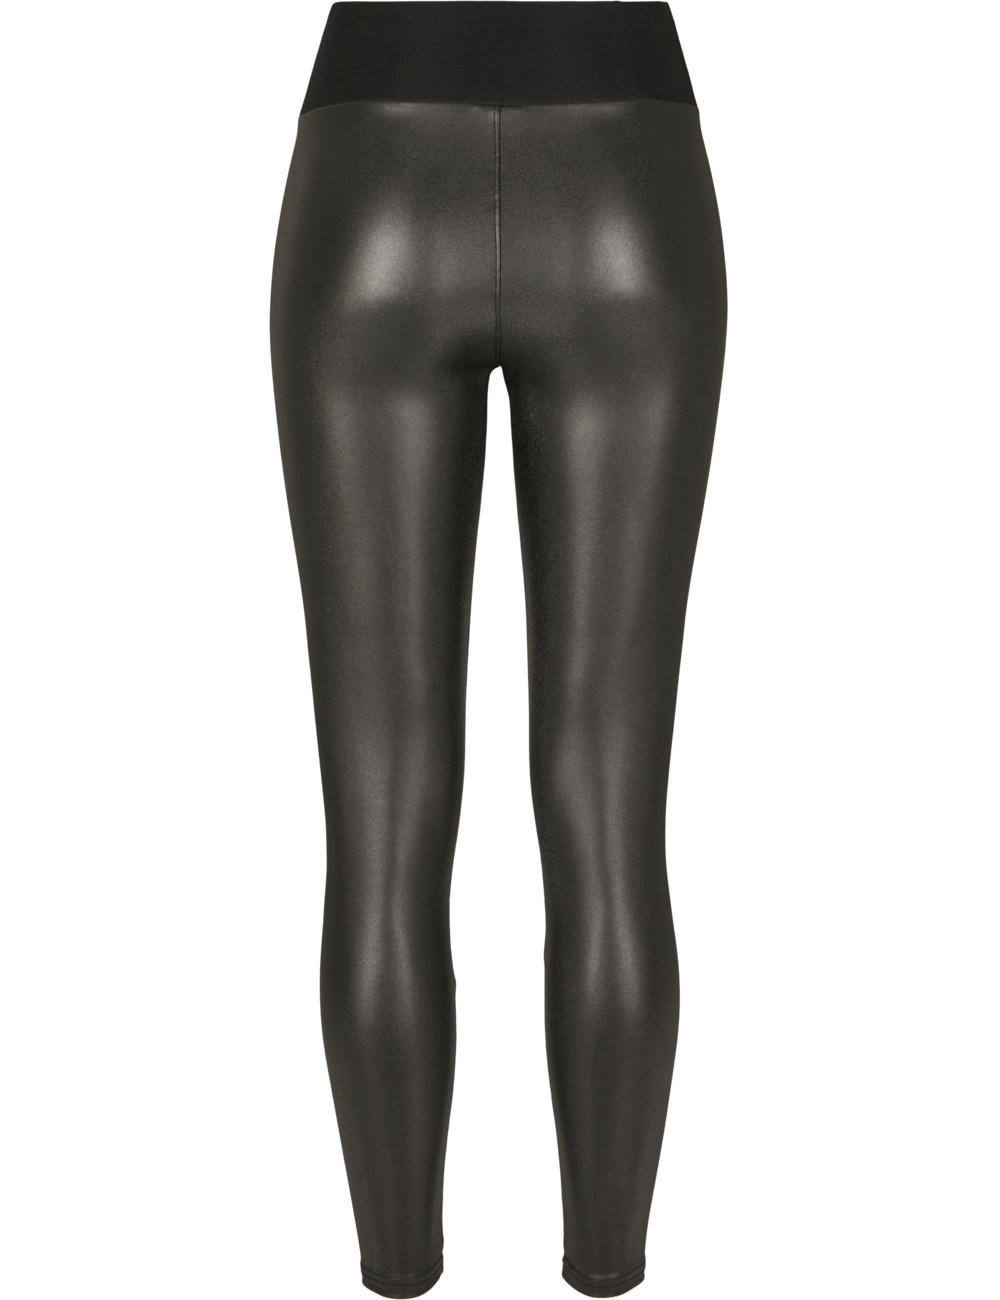 urban-classics-ladies-faux-leather-high-waist-leggings